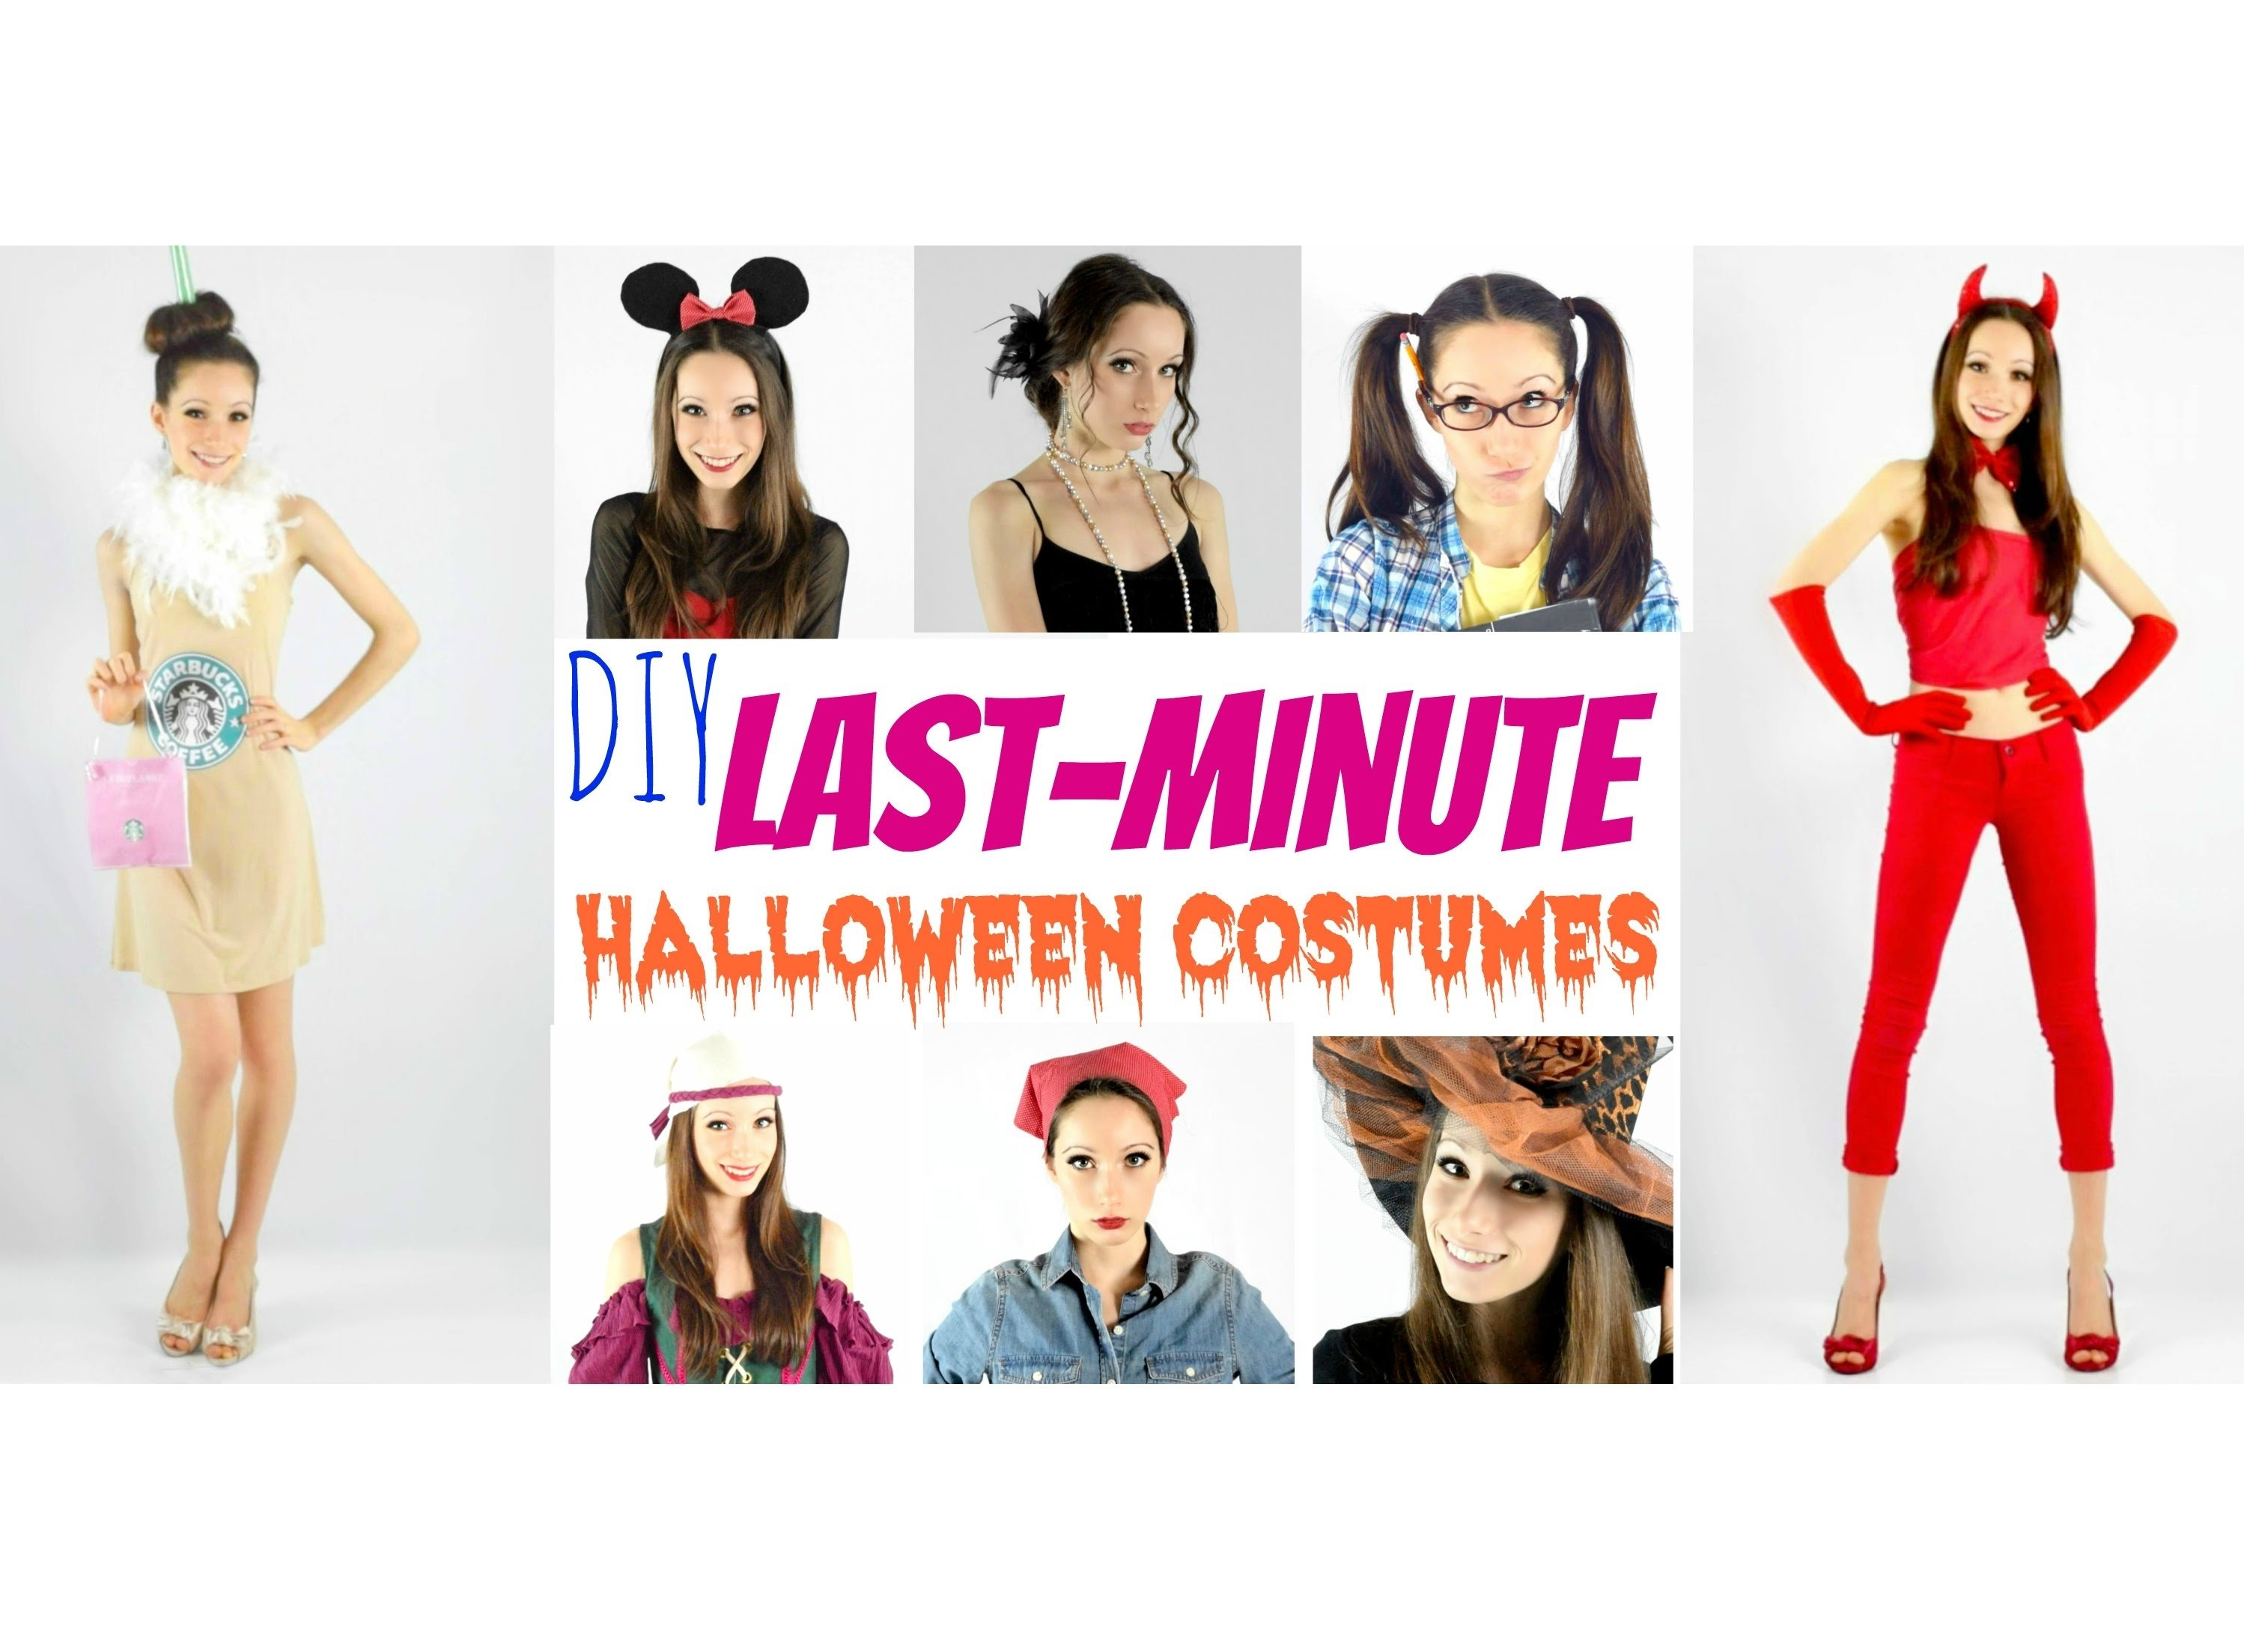 10 Elegant Quick Easy Halloween Costume Ideas 15 diy halloween costumes 3